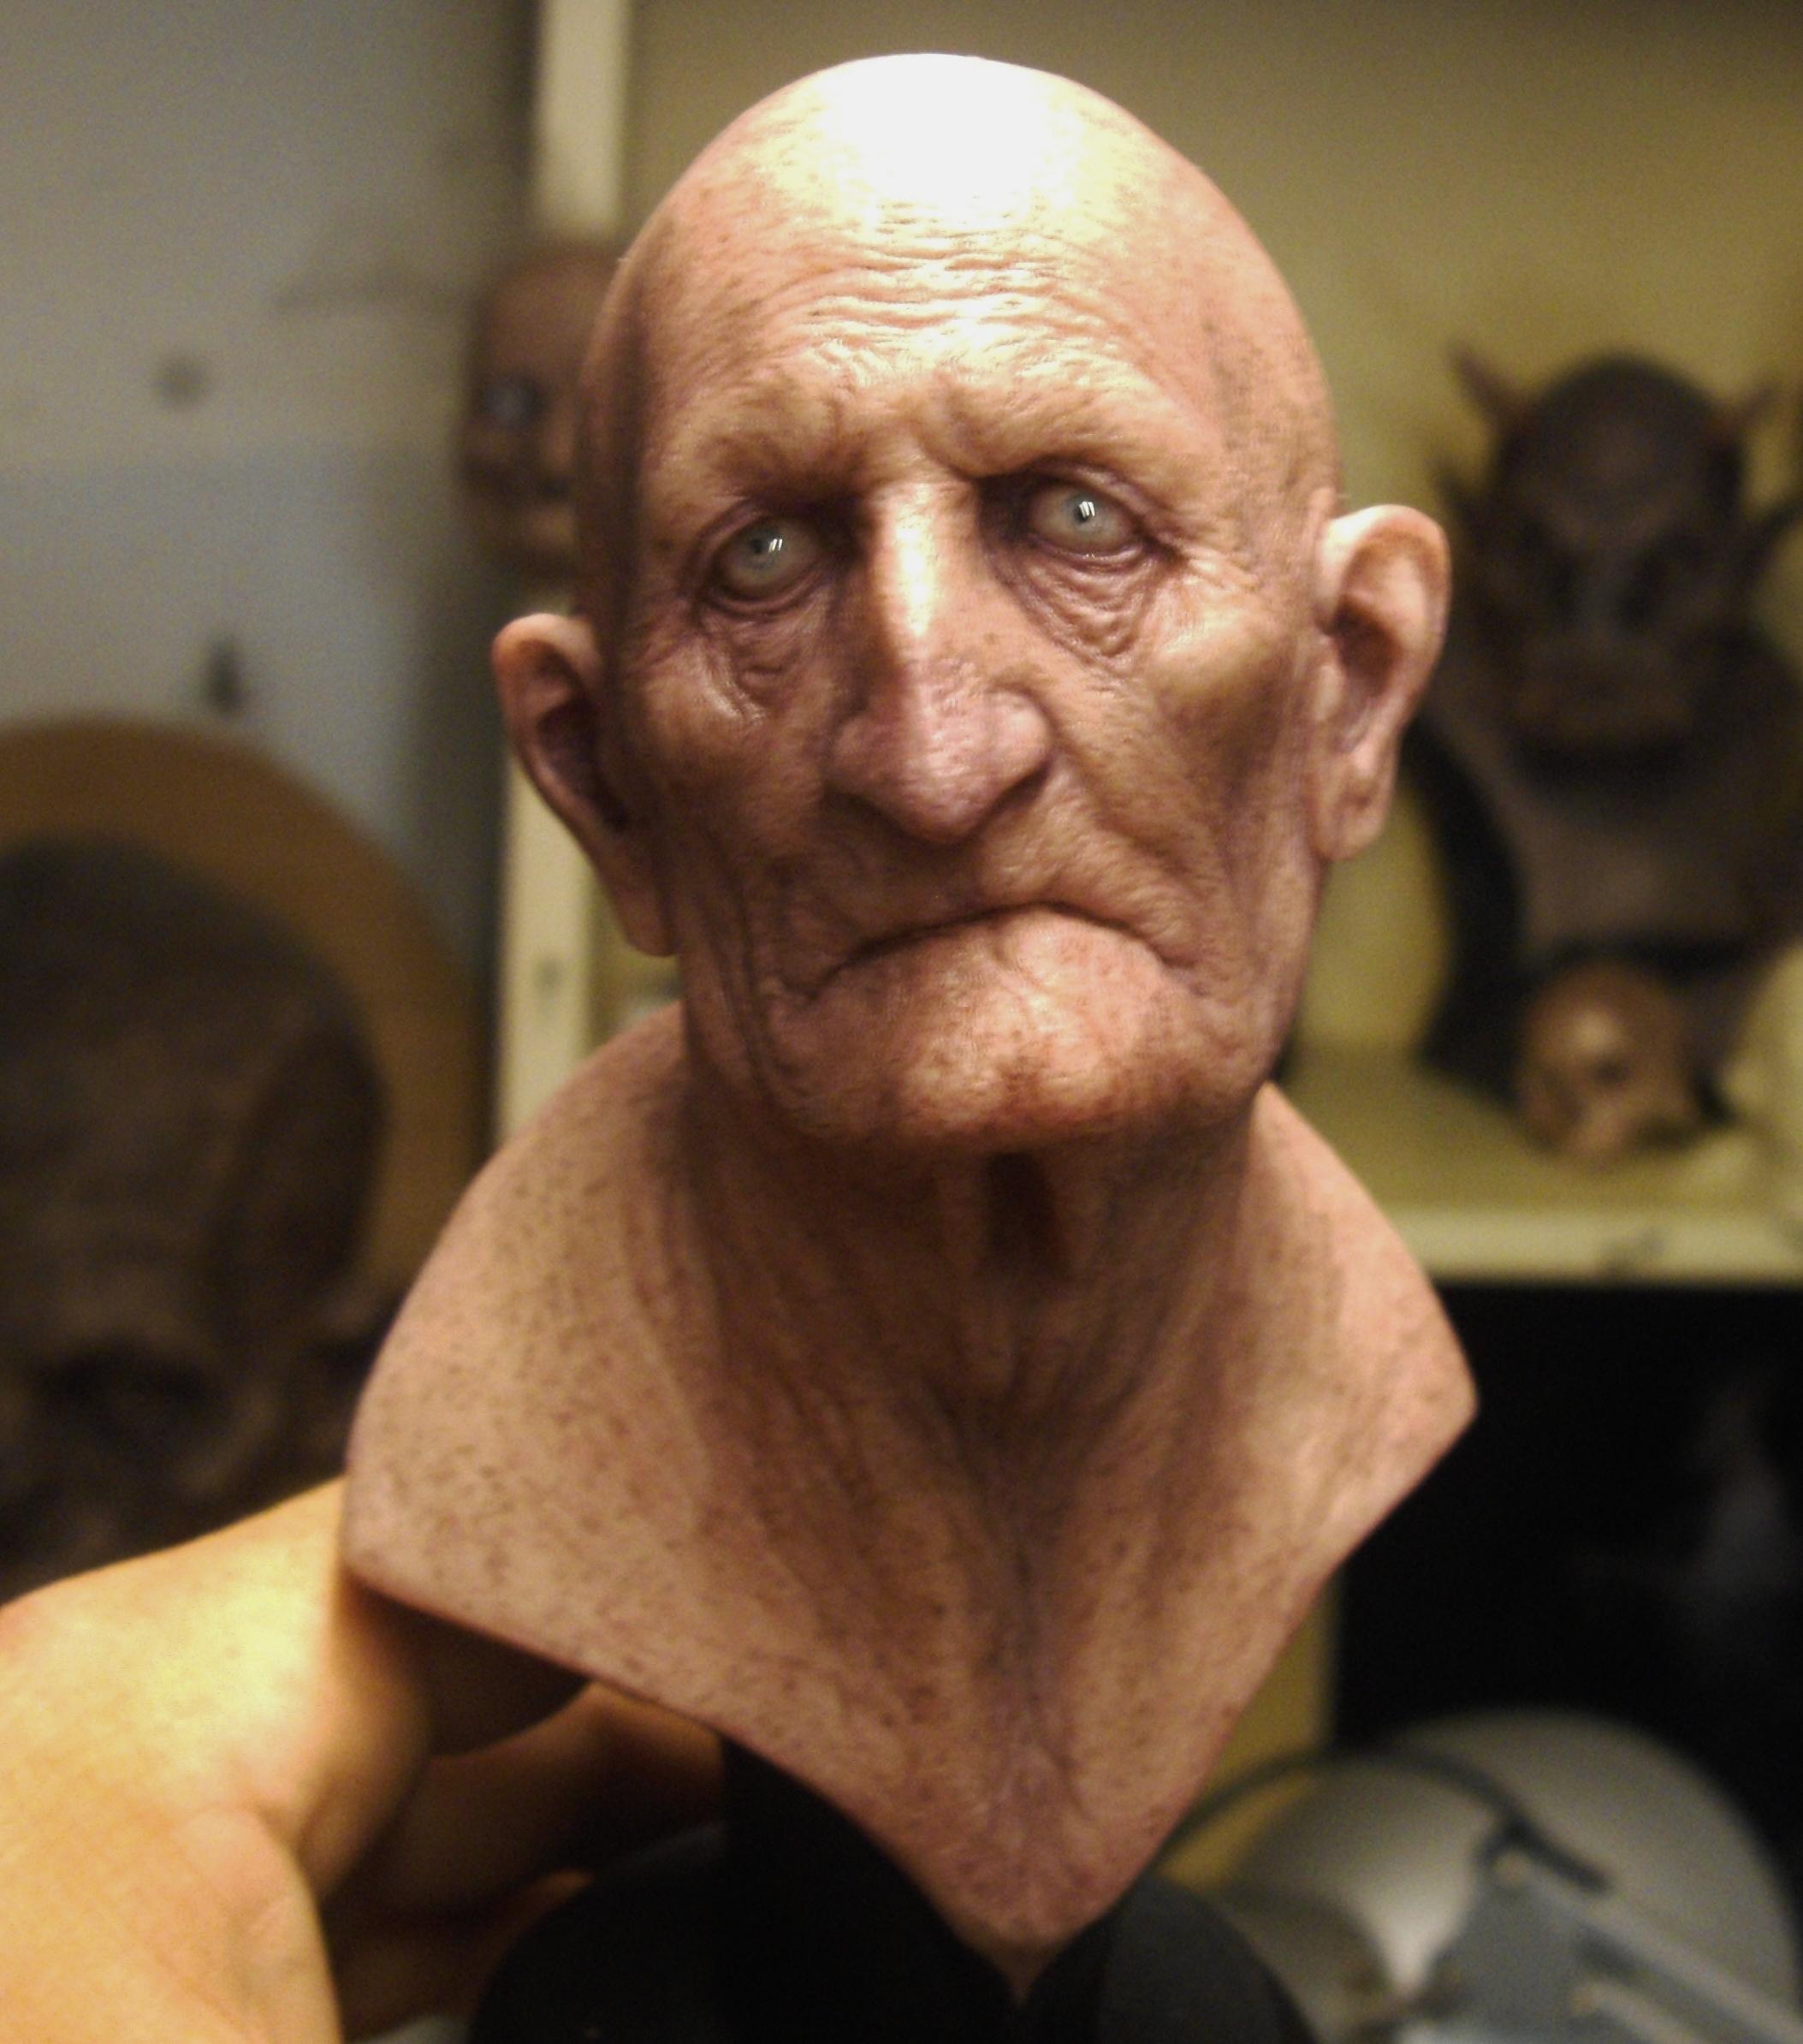 Old man by BOULARIS